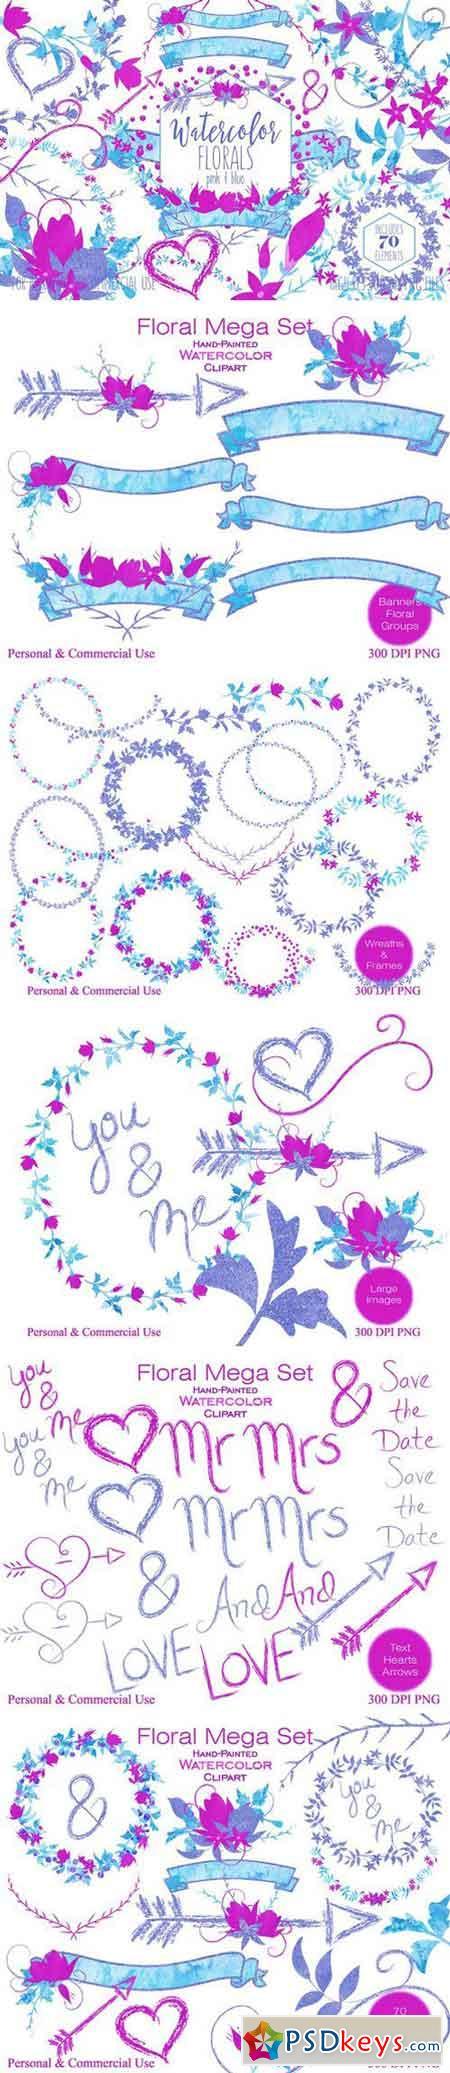 Pink & Blue Watercolor Floral Set 2176158